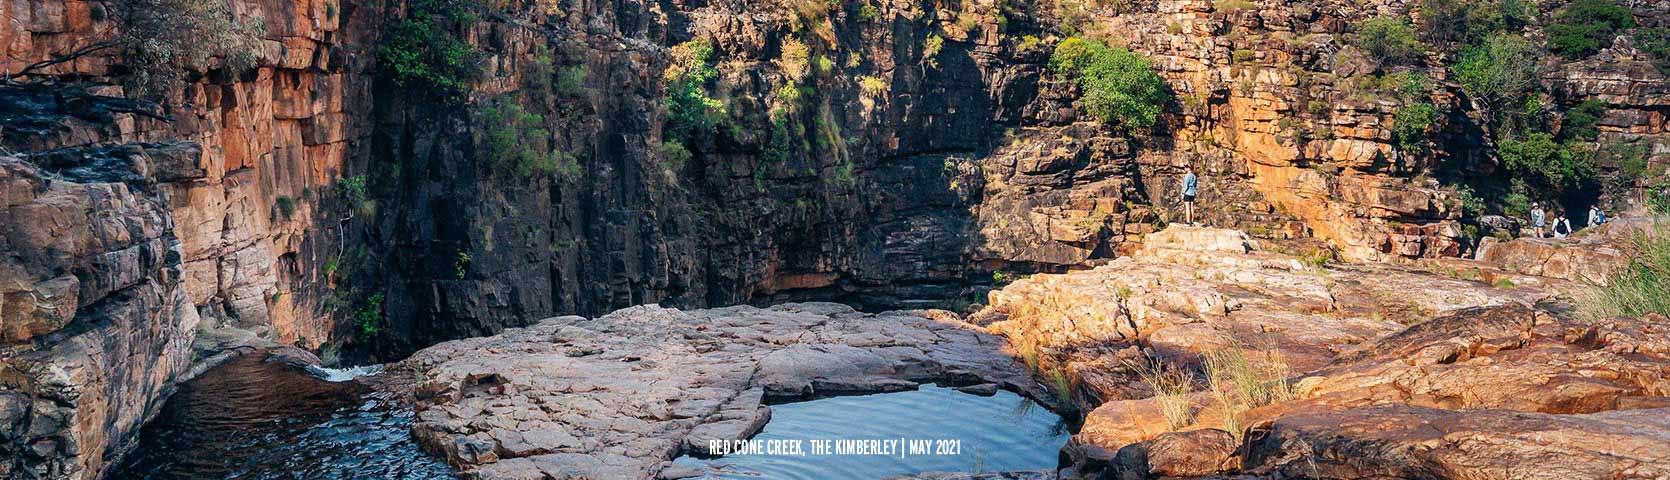 Red-Cone-Creek-on-Kimberley-Cruise-May-2021-Isaac